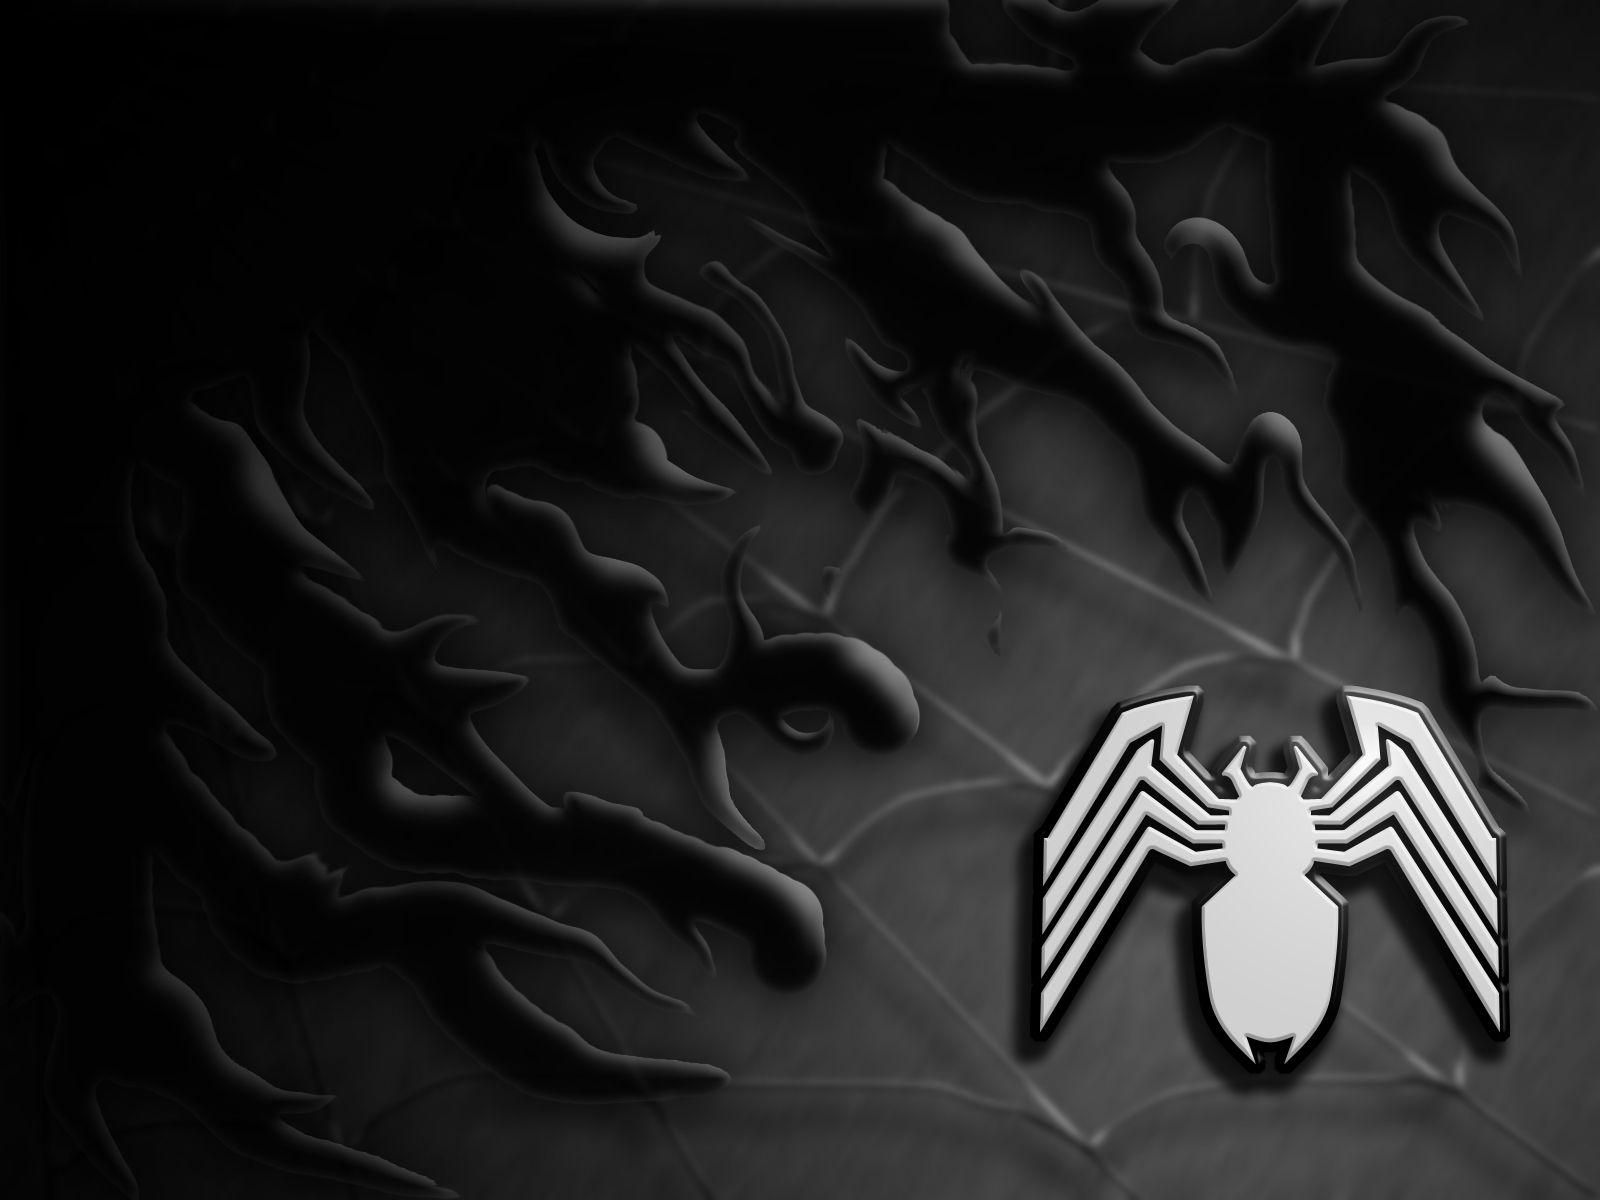 Venom vs carnage wallpaper supers pinterest venom venom wallpaper and background voltagebd Image collections